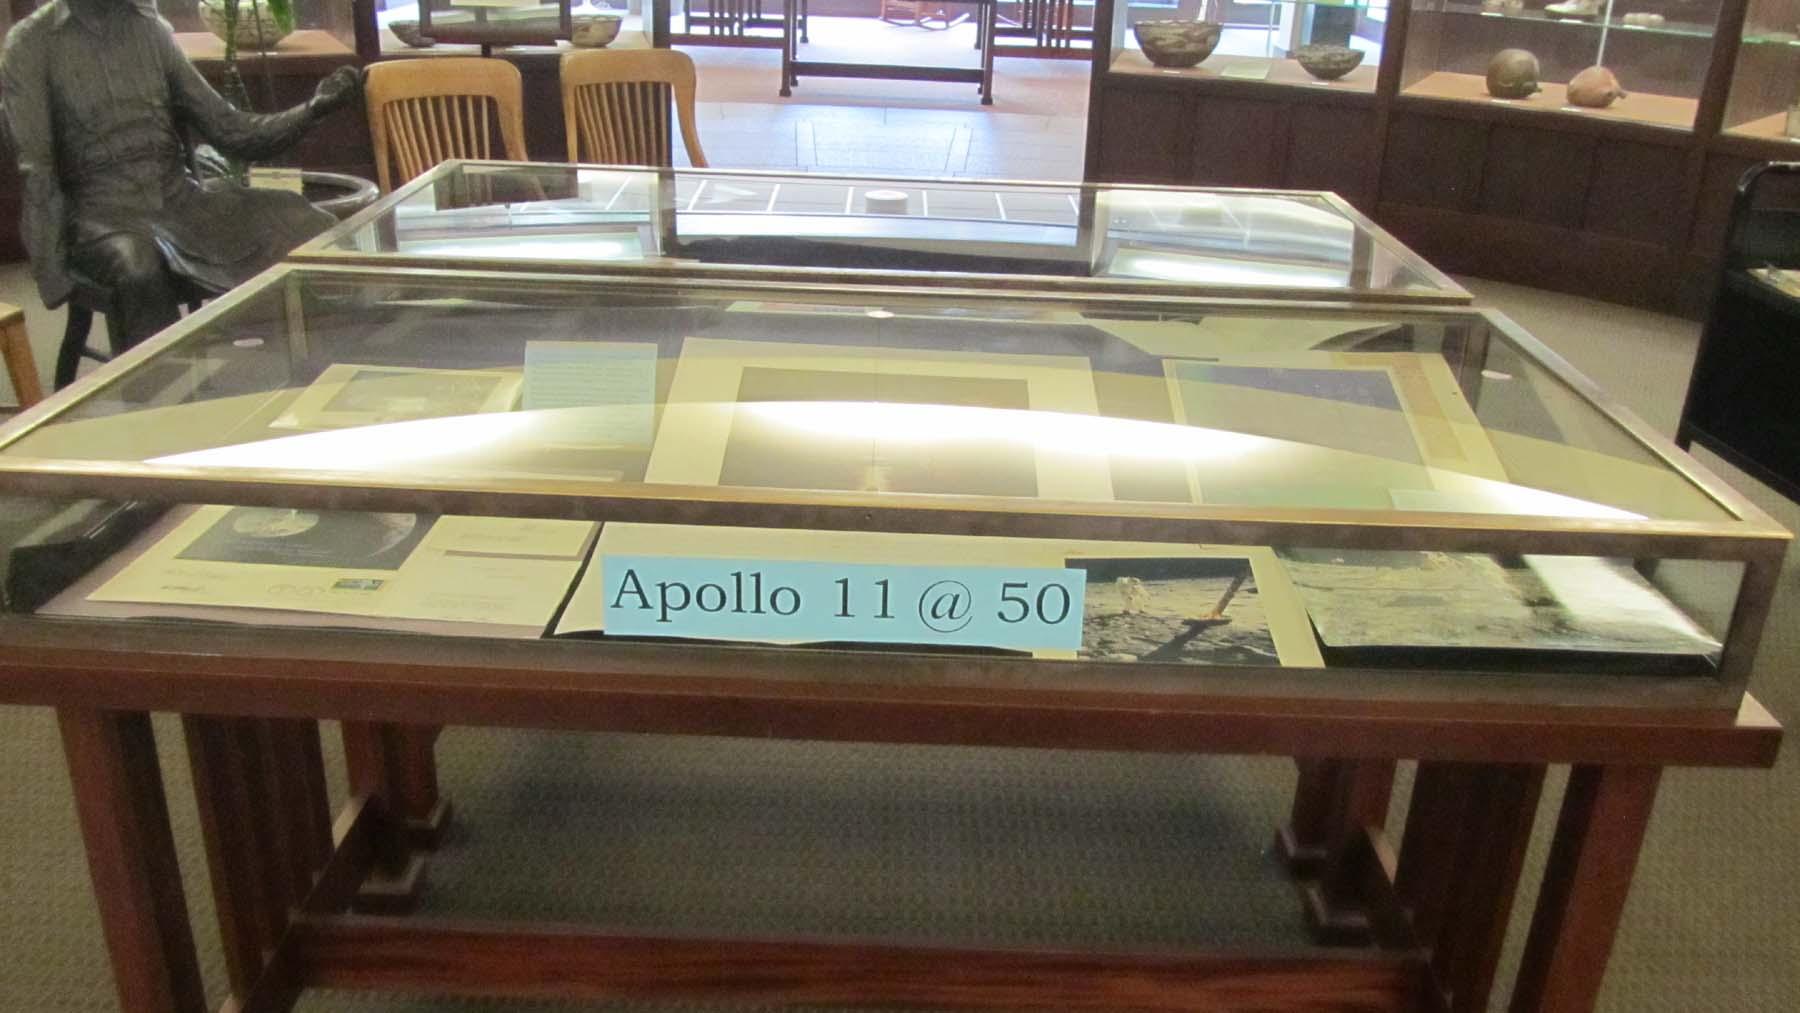 Apollo 11 exhibit location in JWP Rotunda